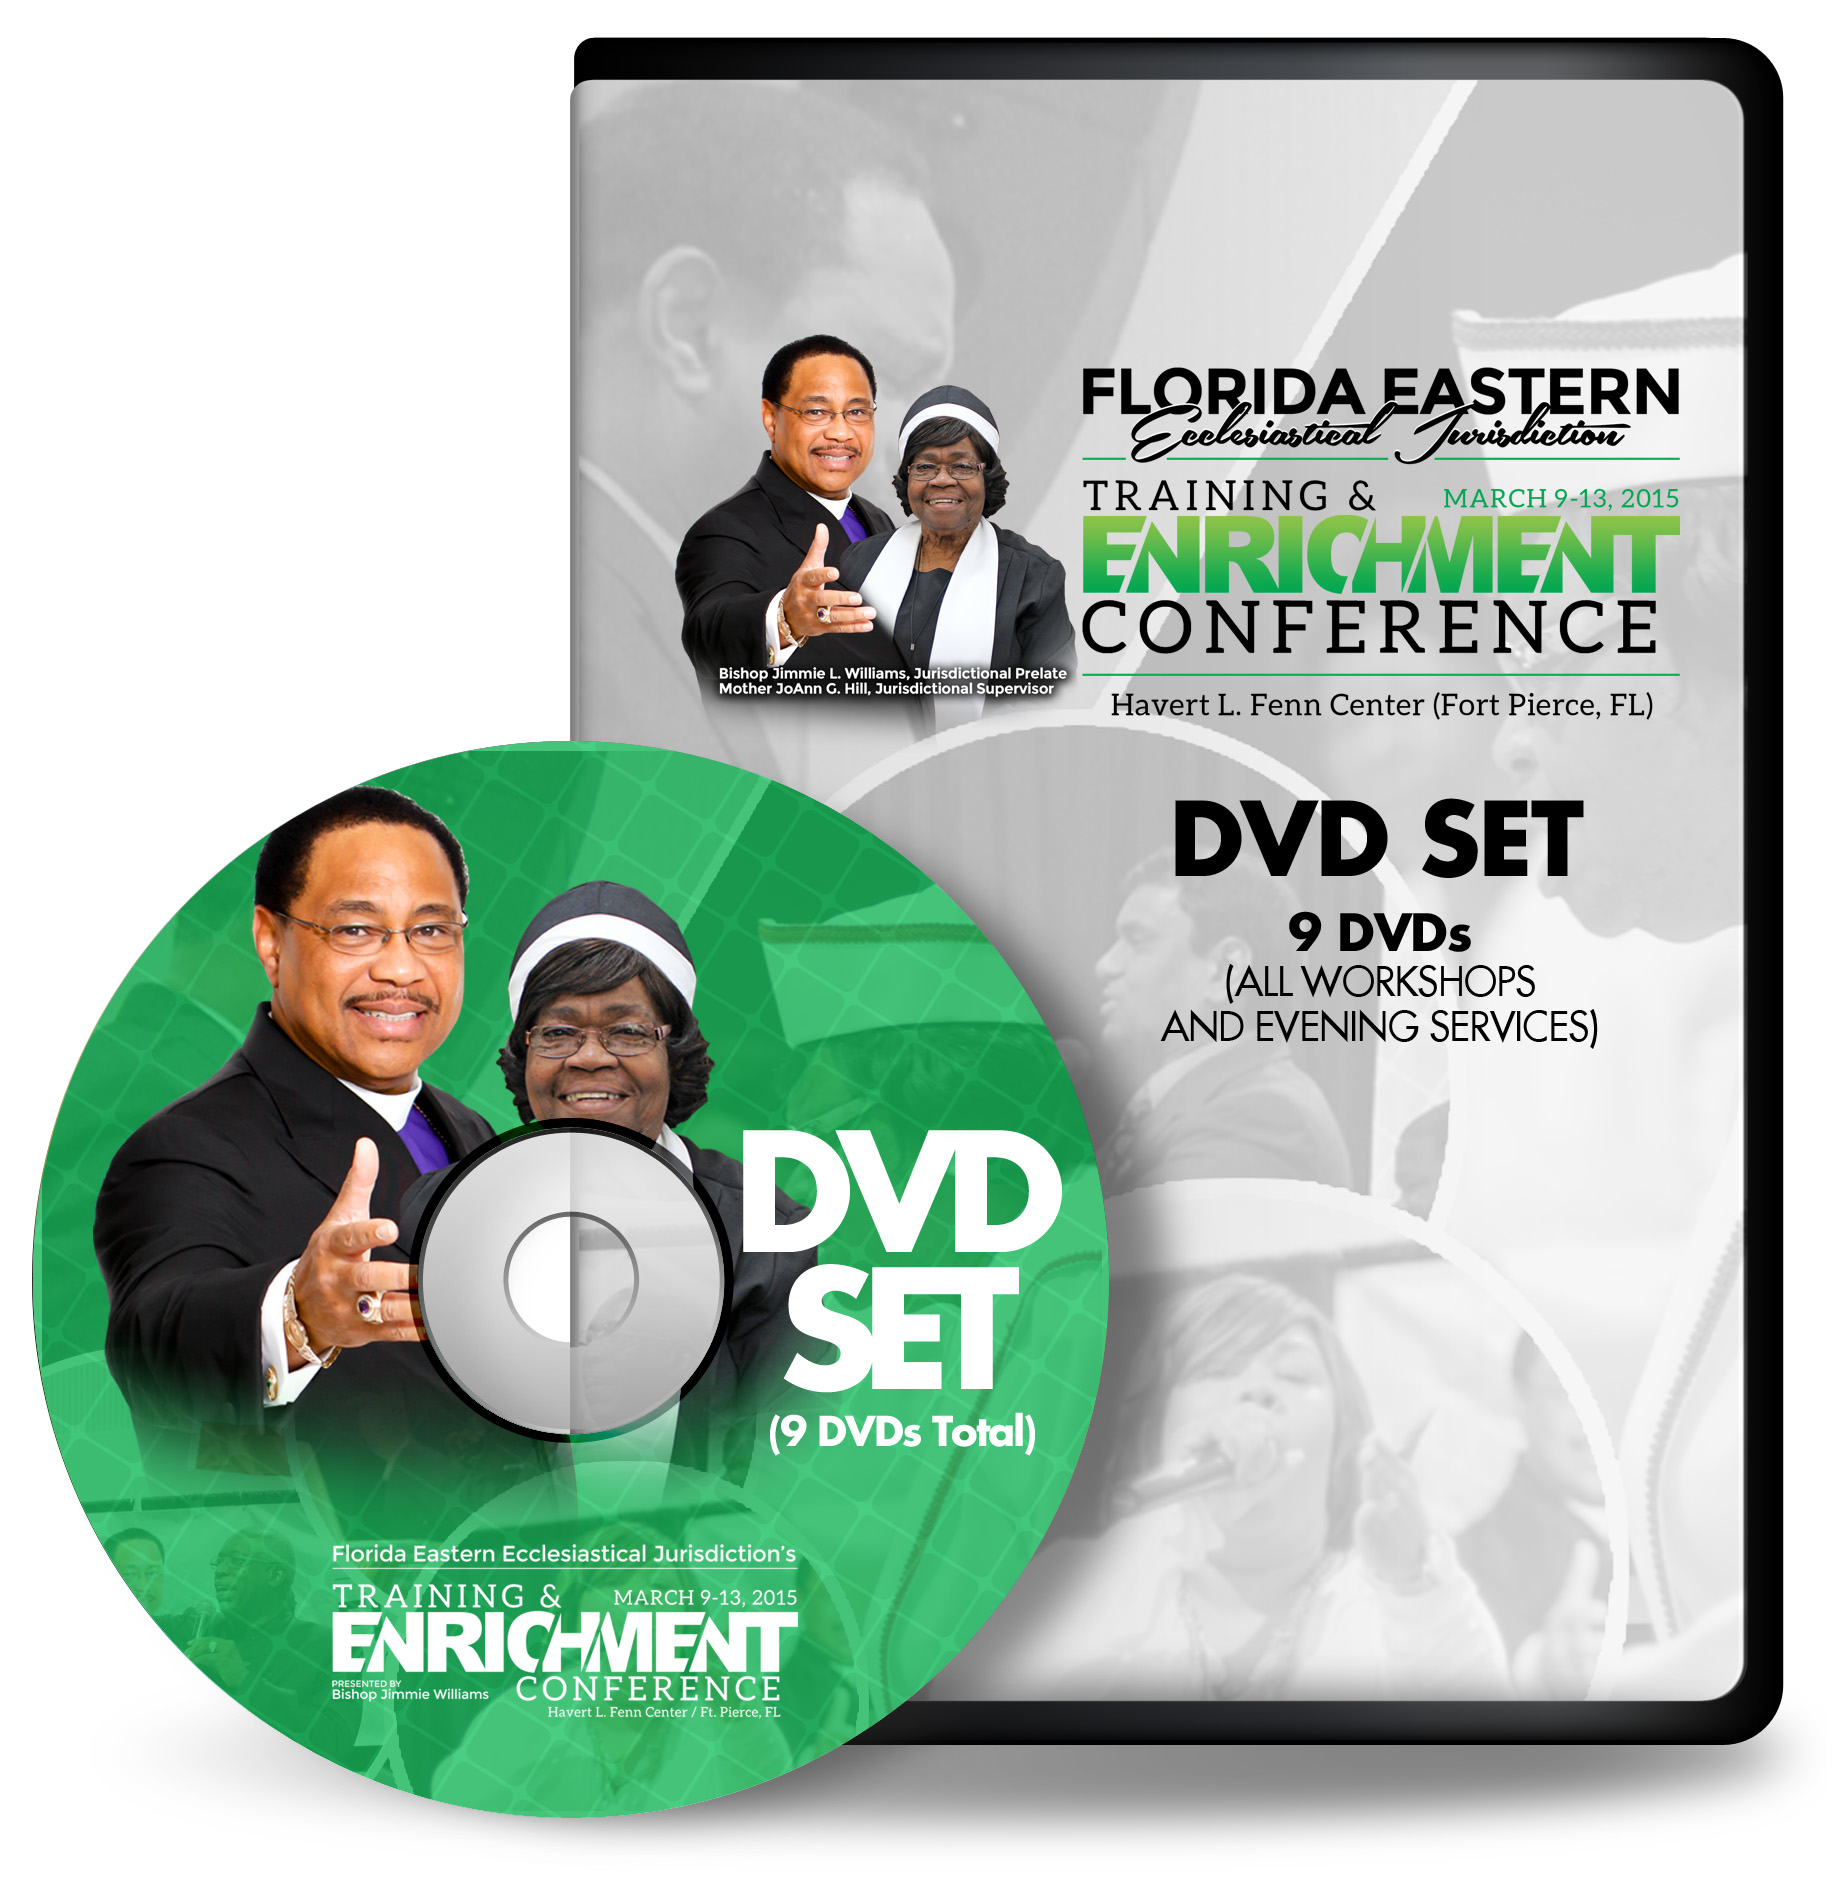 floridaeastern-dvd-complete-set